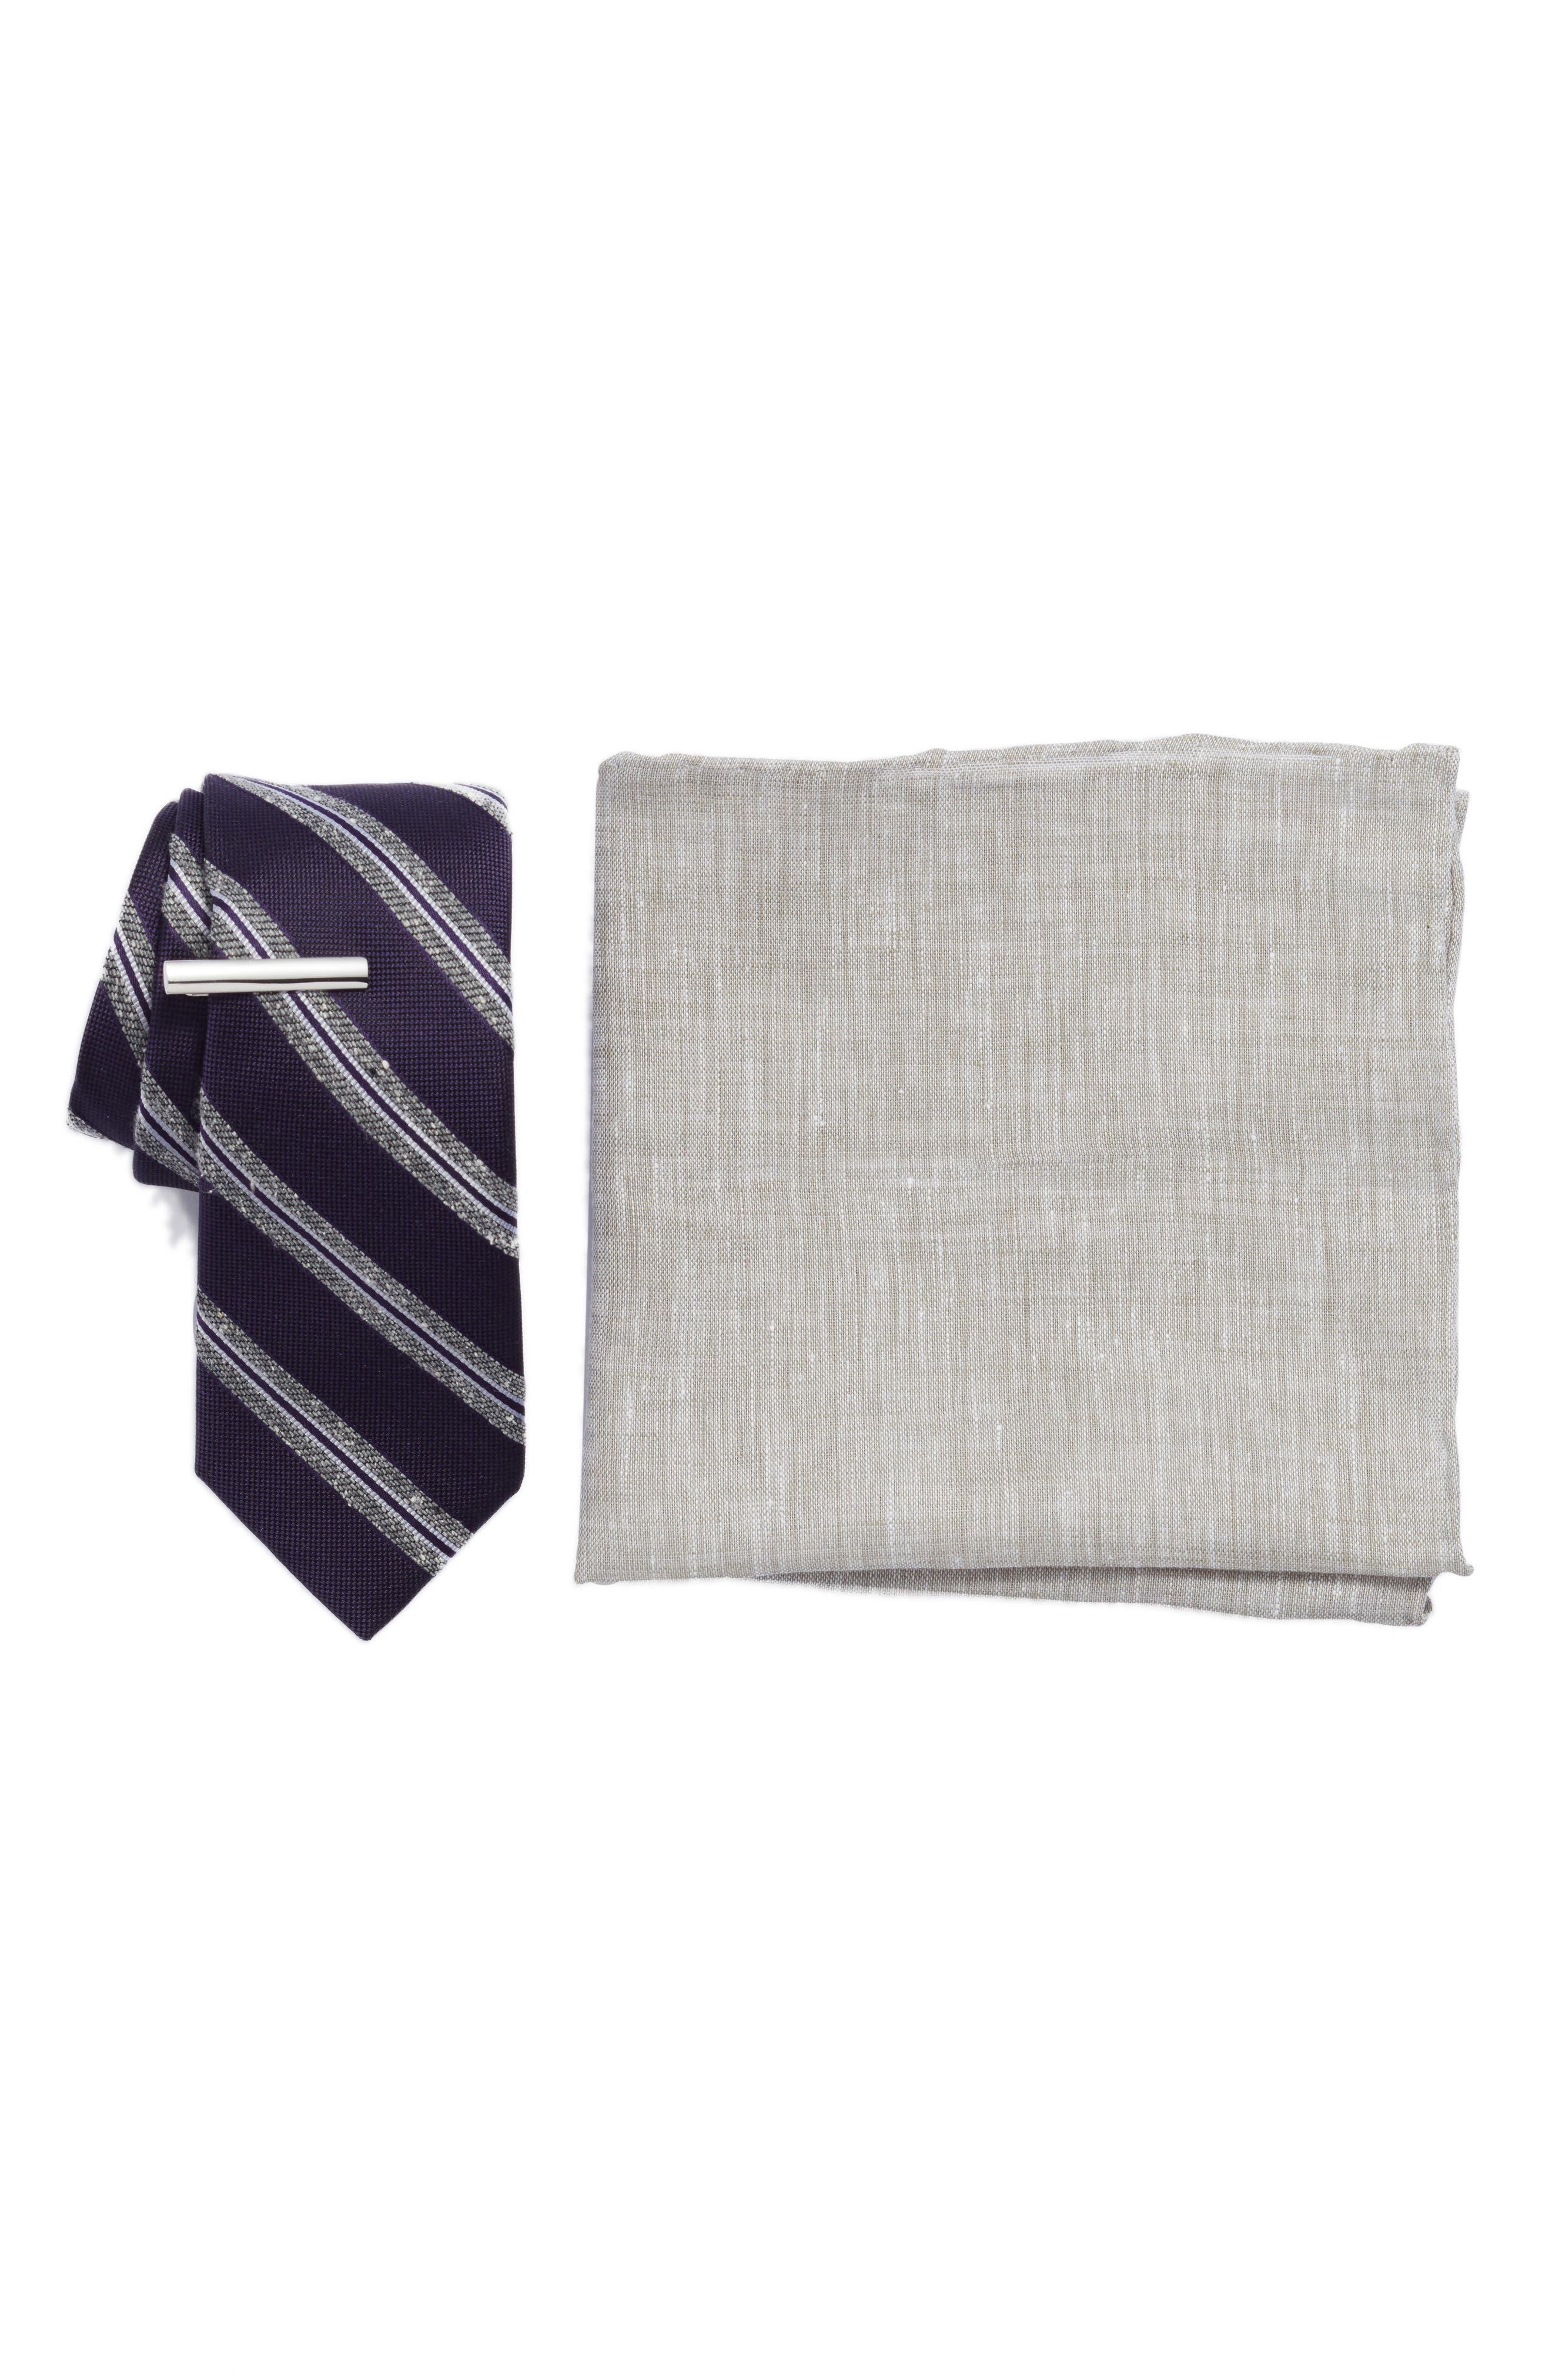 Edison Stripe 3-Piece Skinny Tie Style Box,                         Main,                         color, EGGPLANT